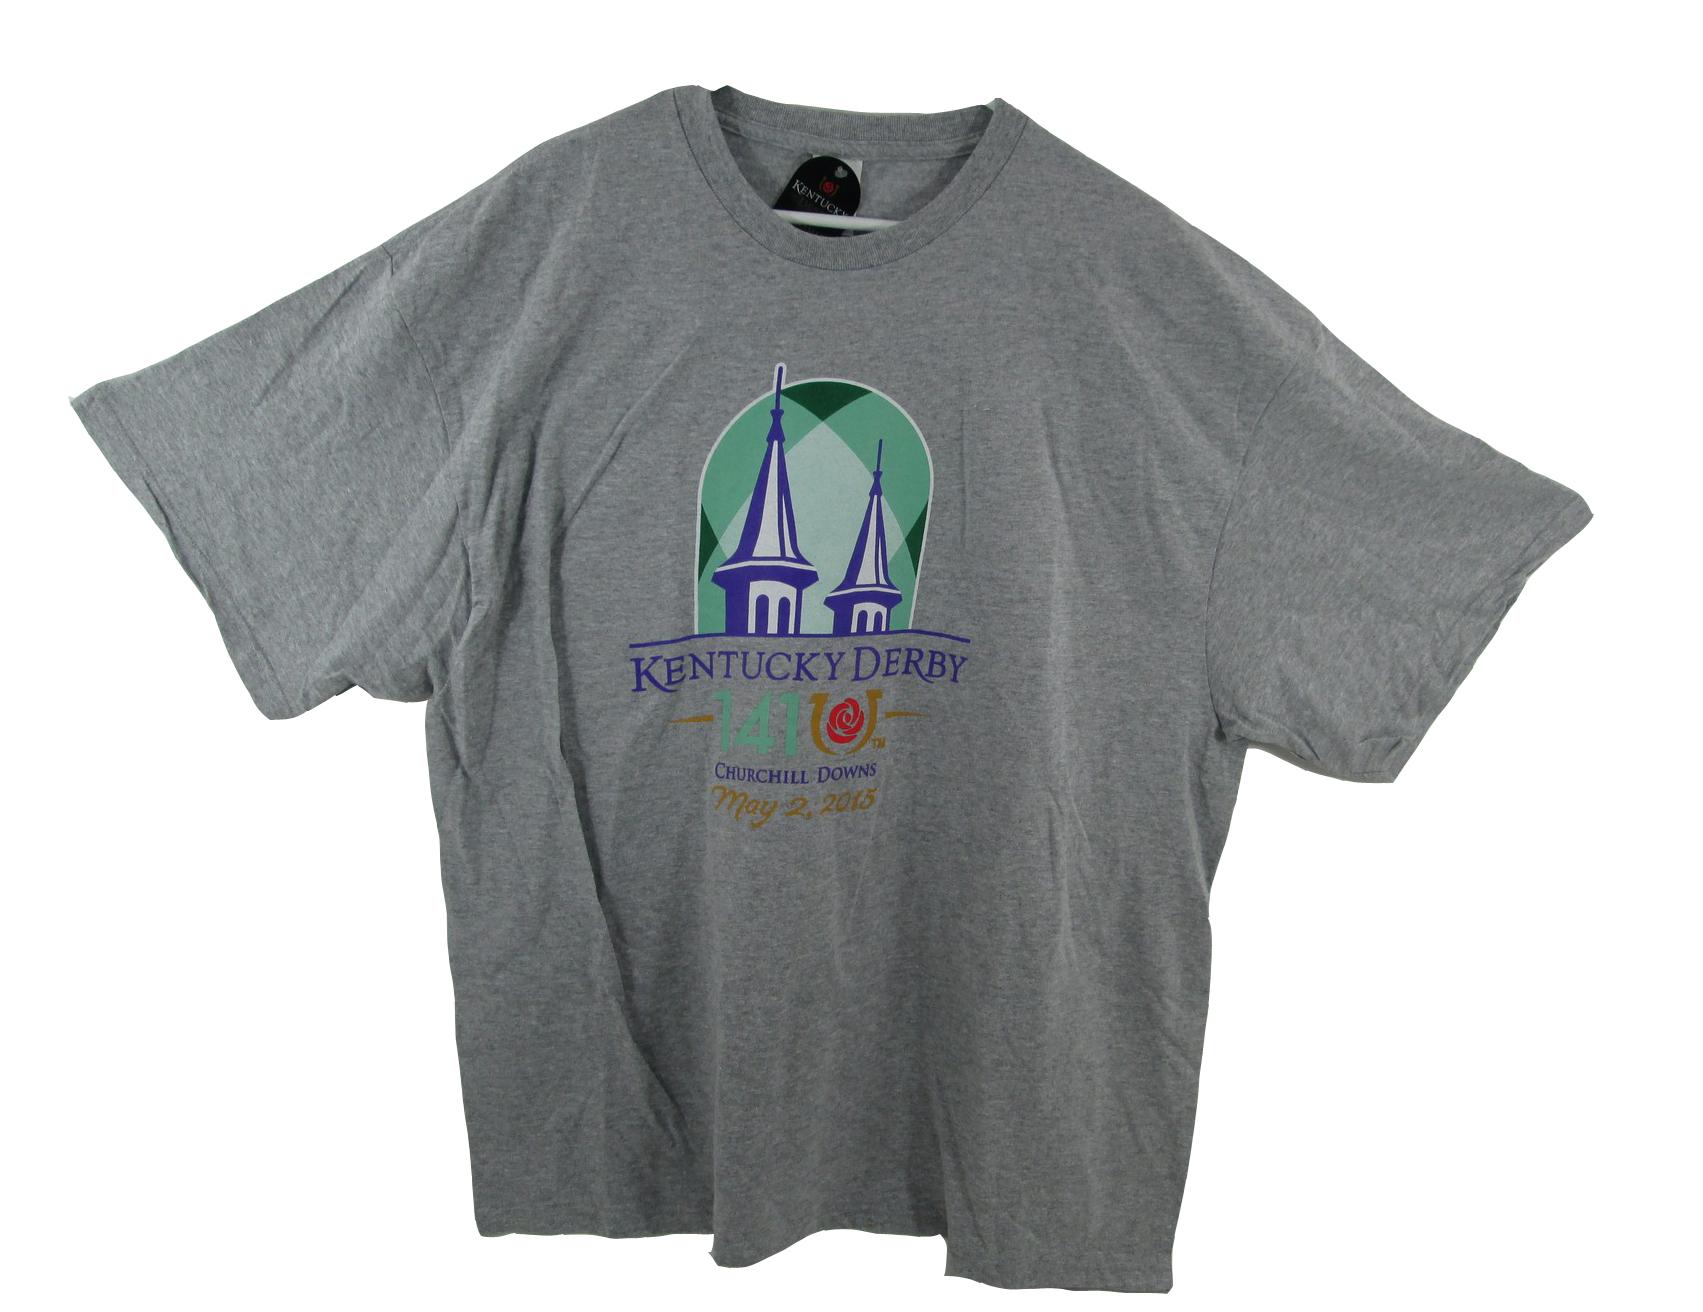 Official Kentucky Derby 141 Green Logo T-Shirt May 2 2015 American Pharoah